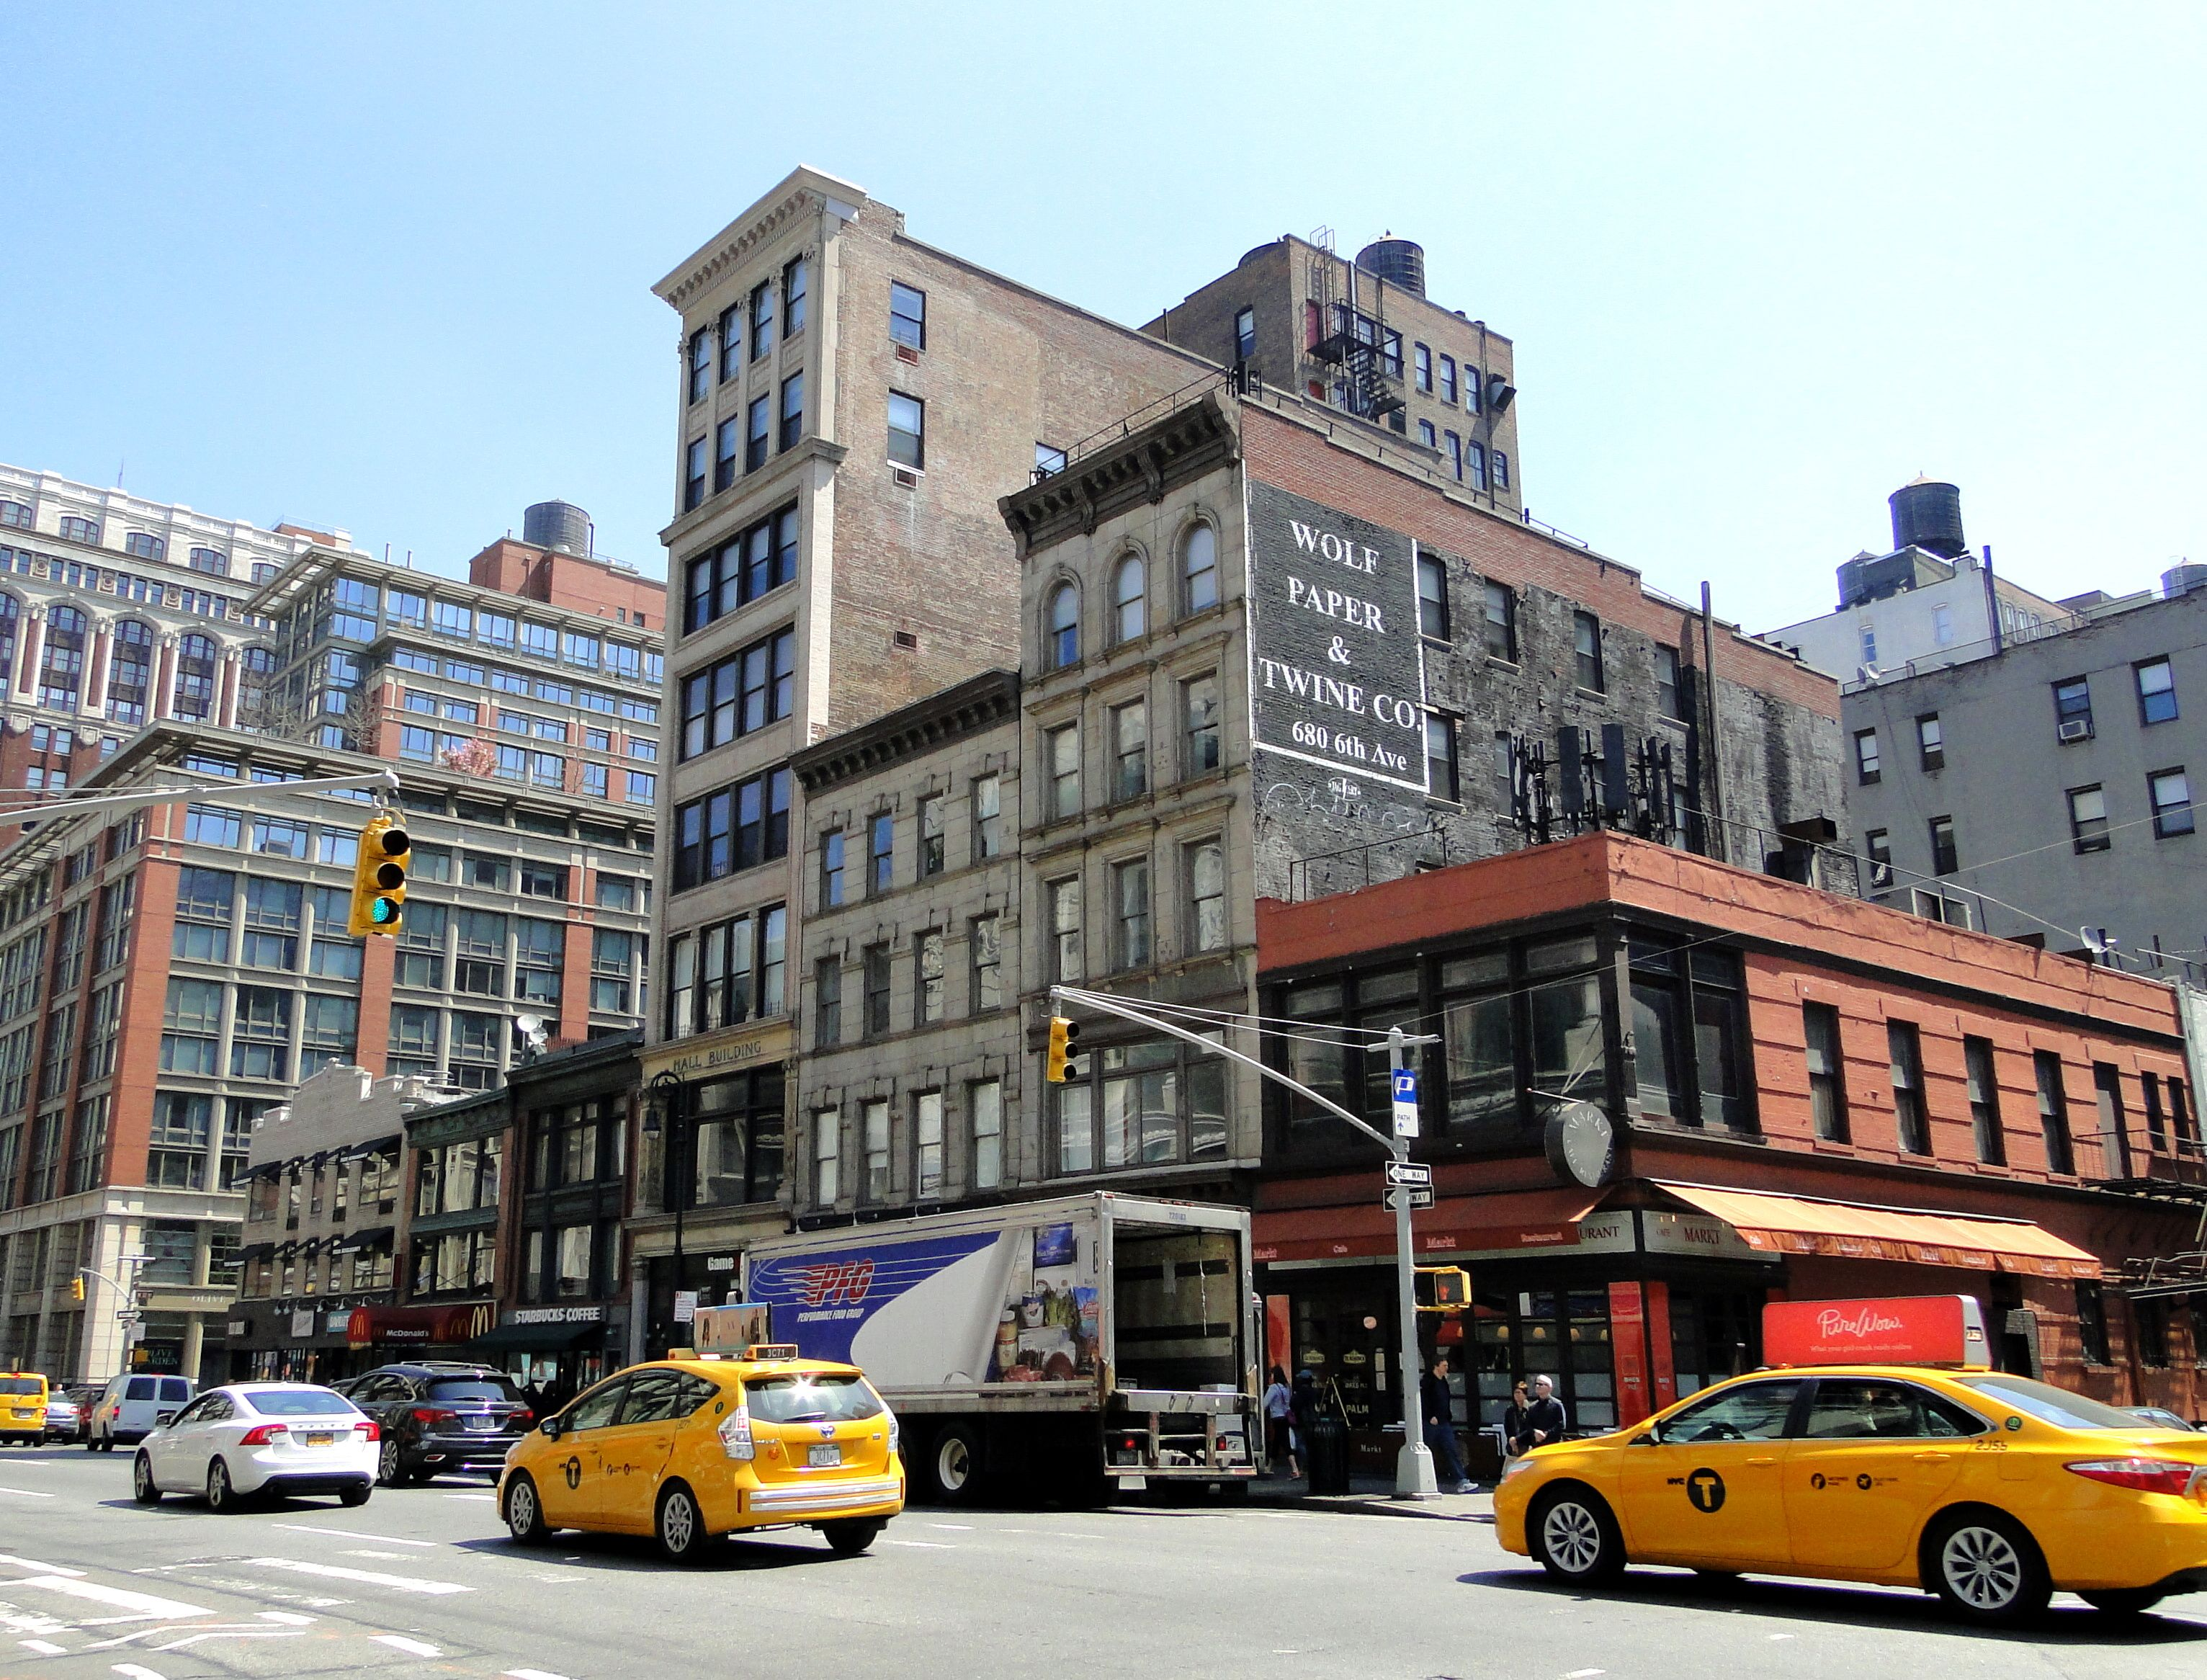 #reiseblogger #newyork #nyc #midtown #jointhesunnyside